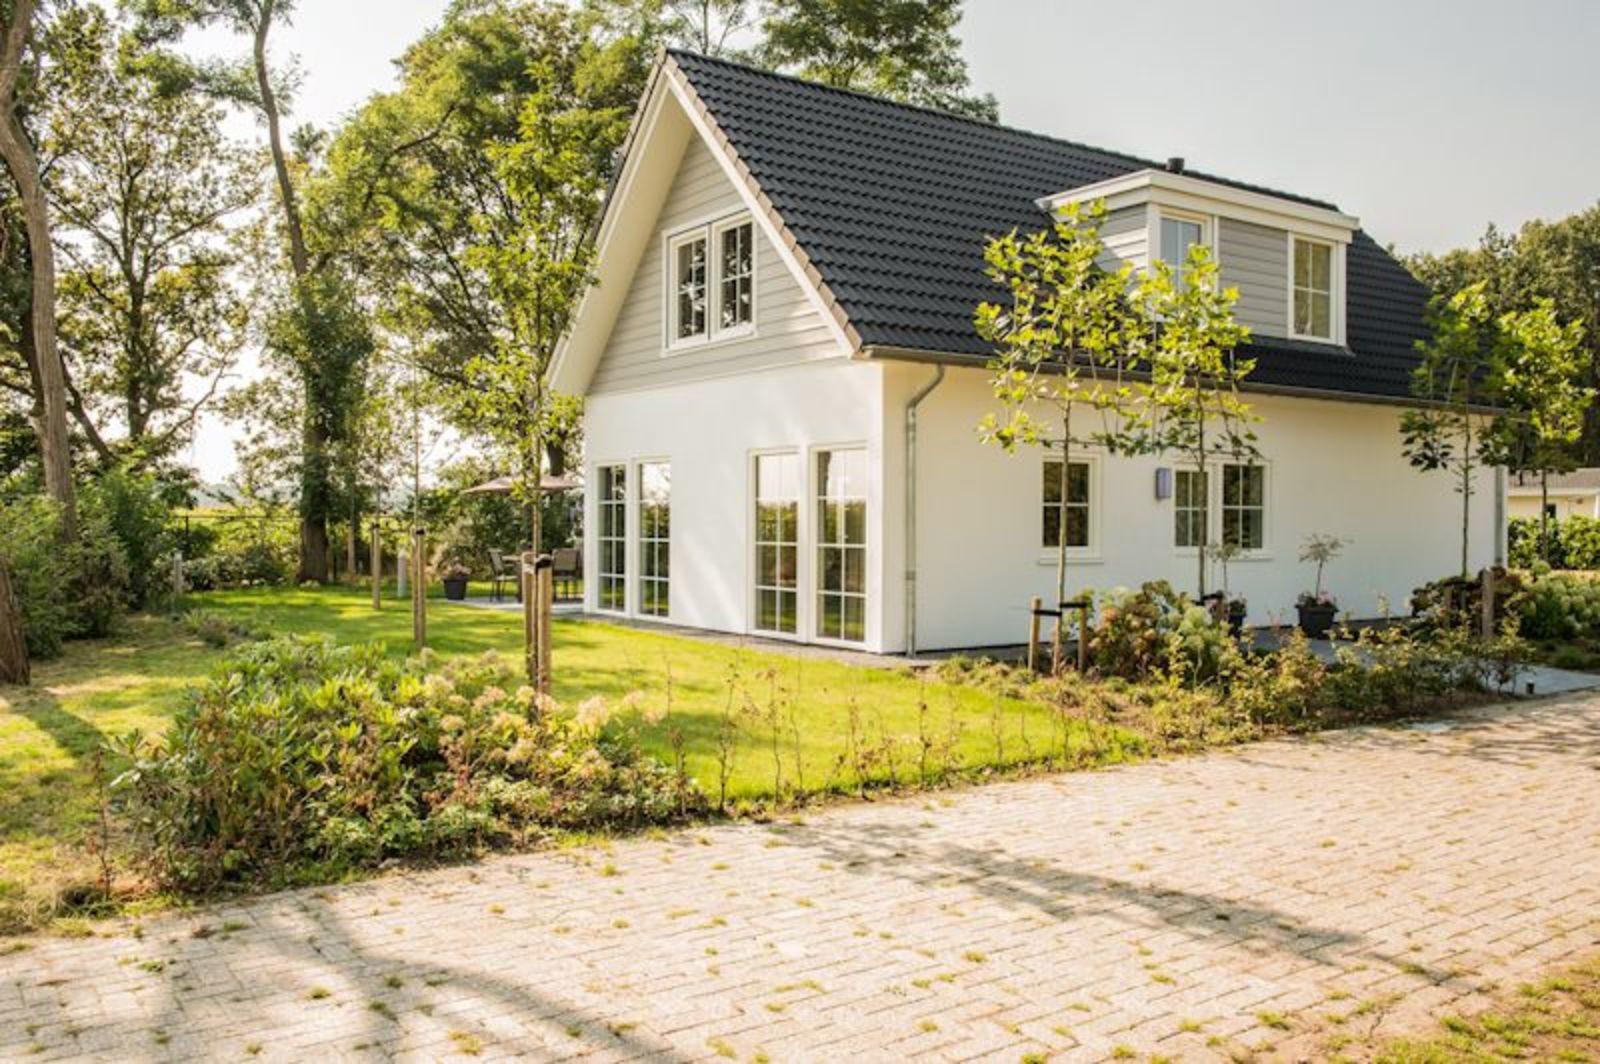 10-persoons villa Brabant